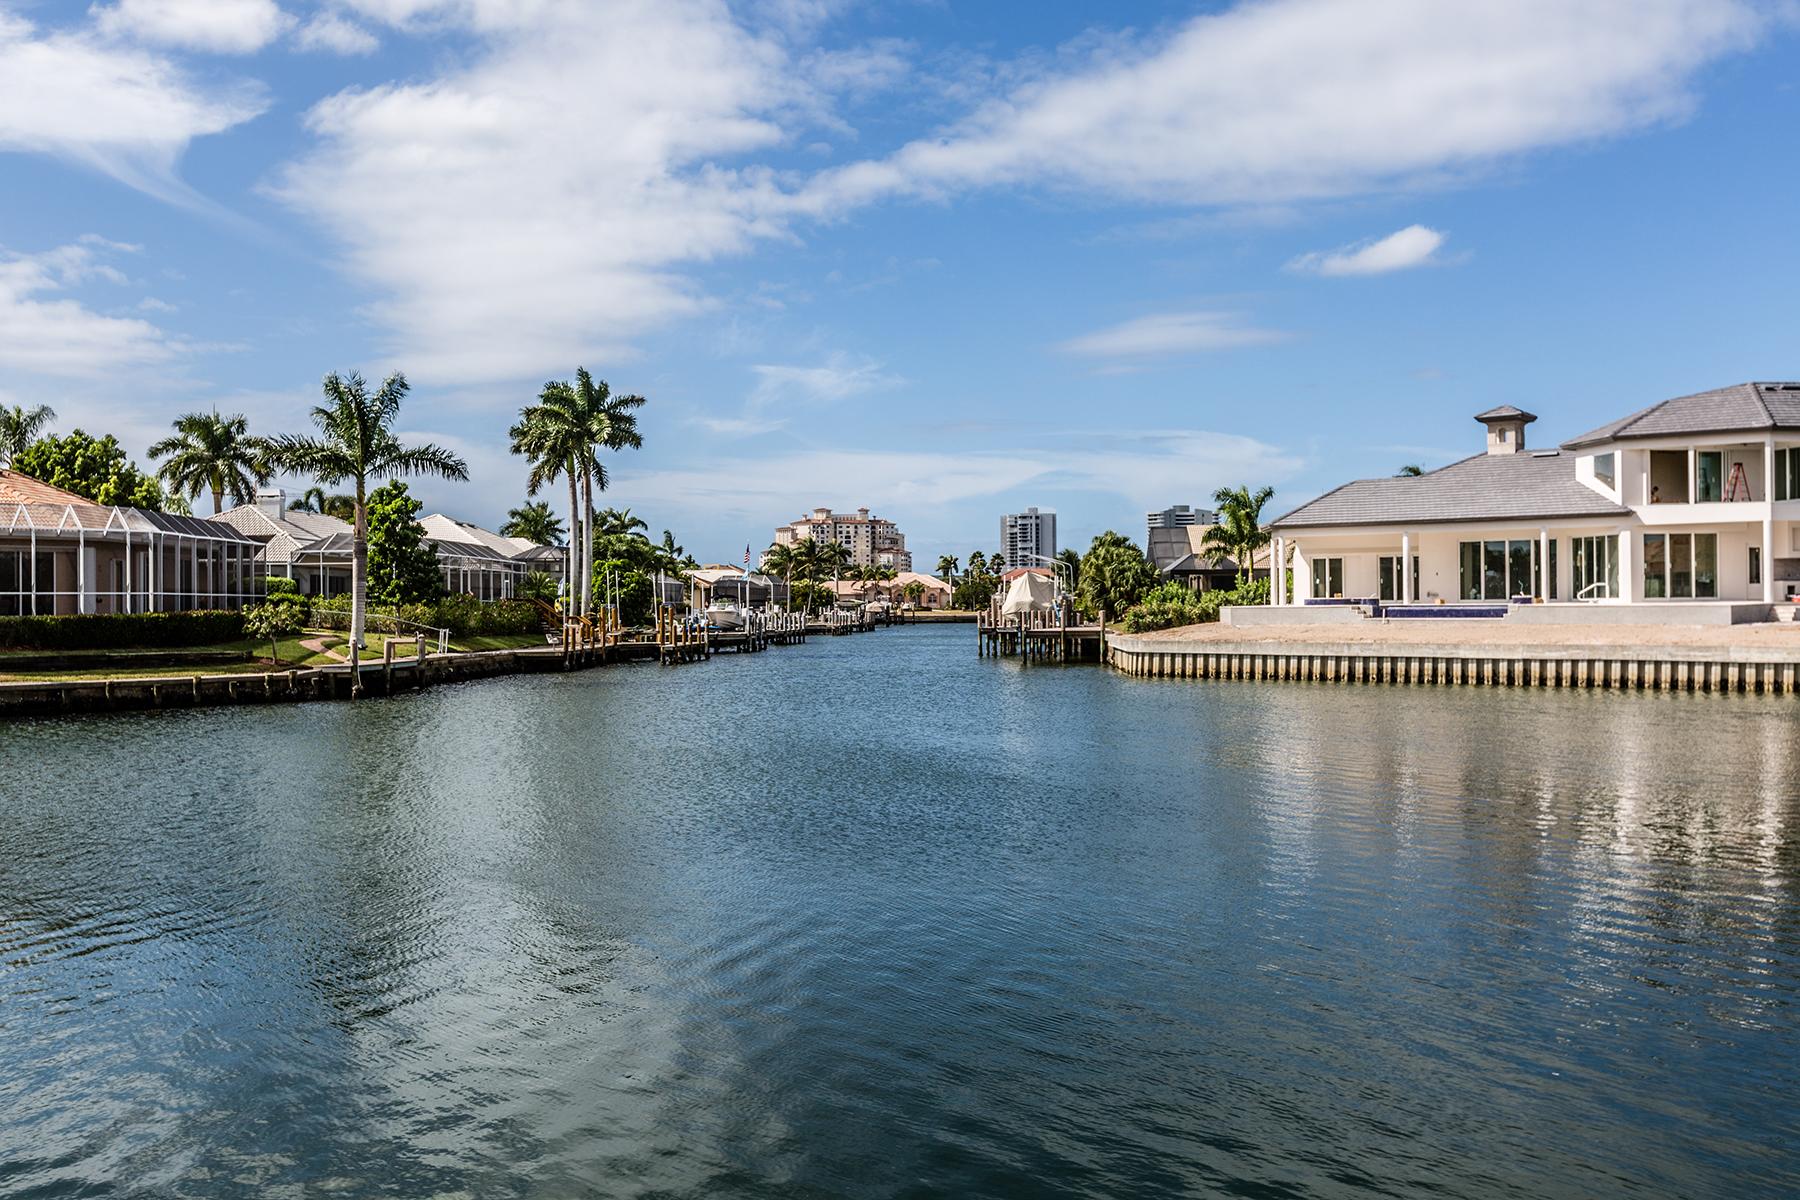 土地 为 销售 在 MARCO ISLAND - WHITEHEART COURT 1153 Whiteheart Ct 马可岛, 佛罗里达州, 34145 美国